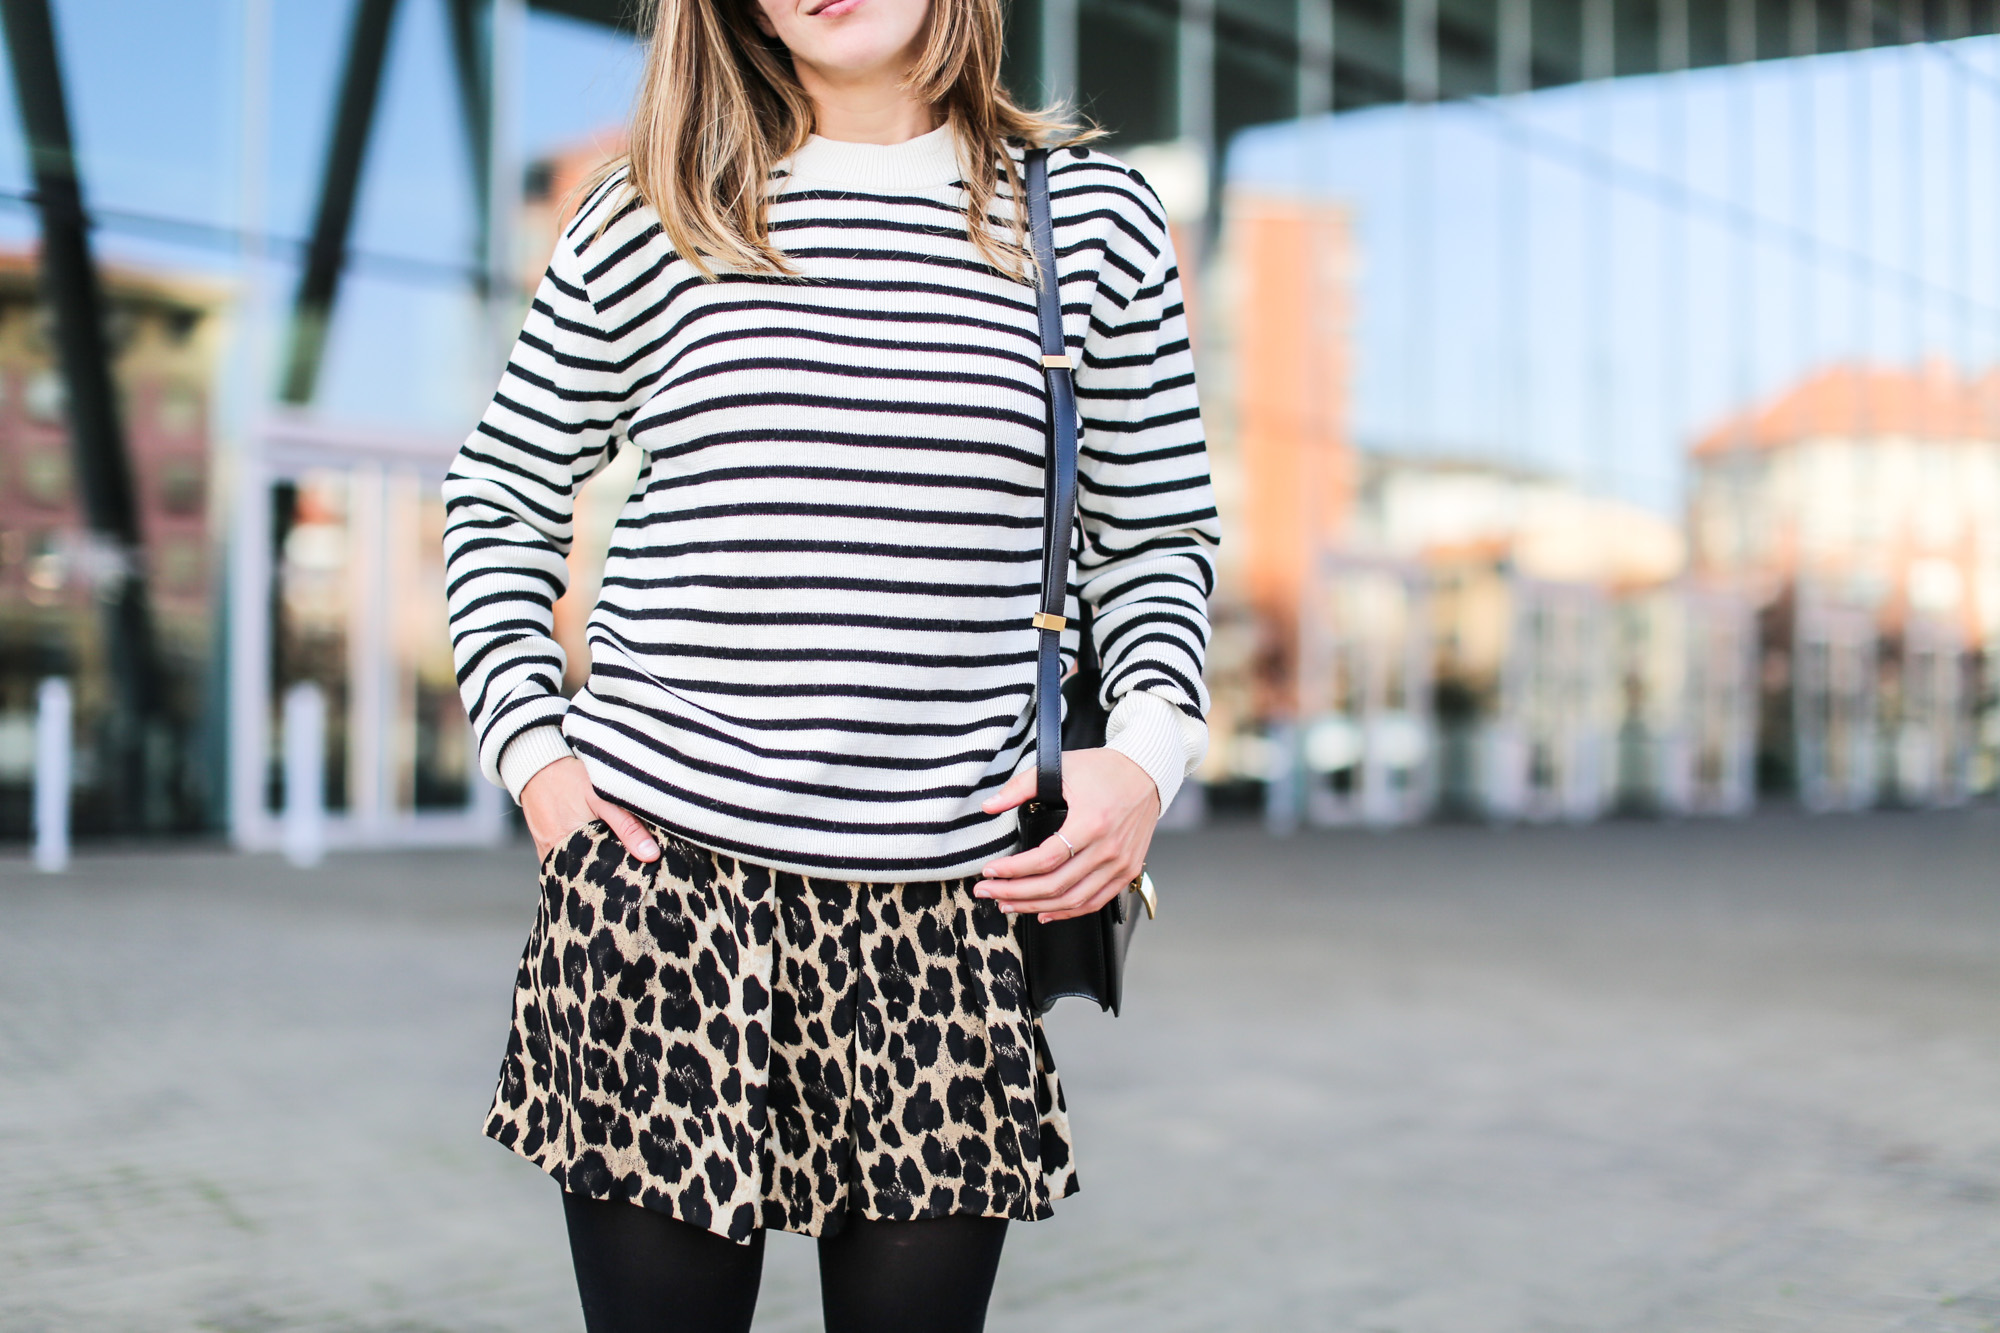 Clochet_streetstyle_fashionblogger_shortsestampadoleopardozara_adidasgazelle_jerseymarinerorayaslanacos_celineboxbag-5